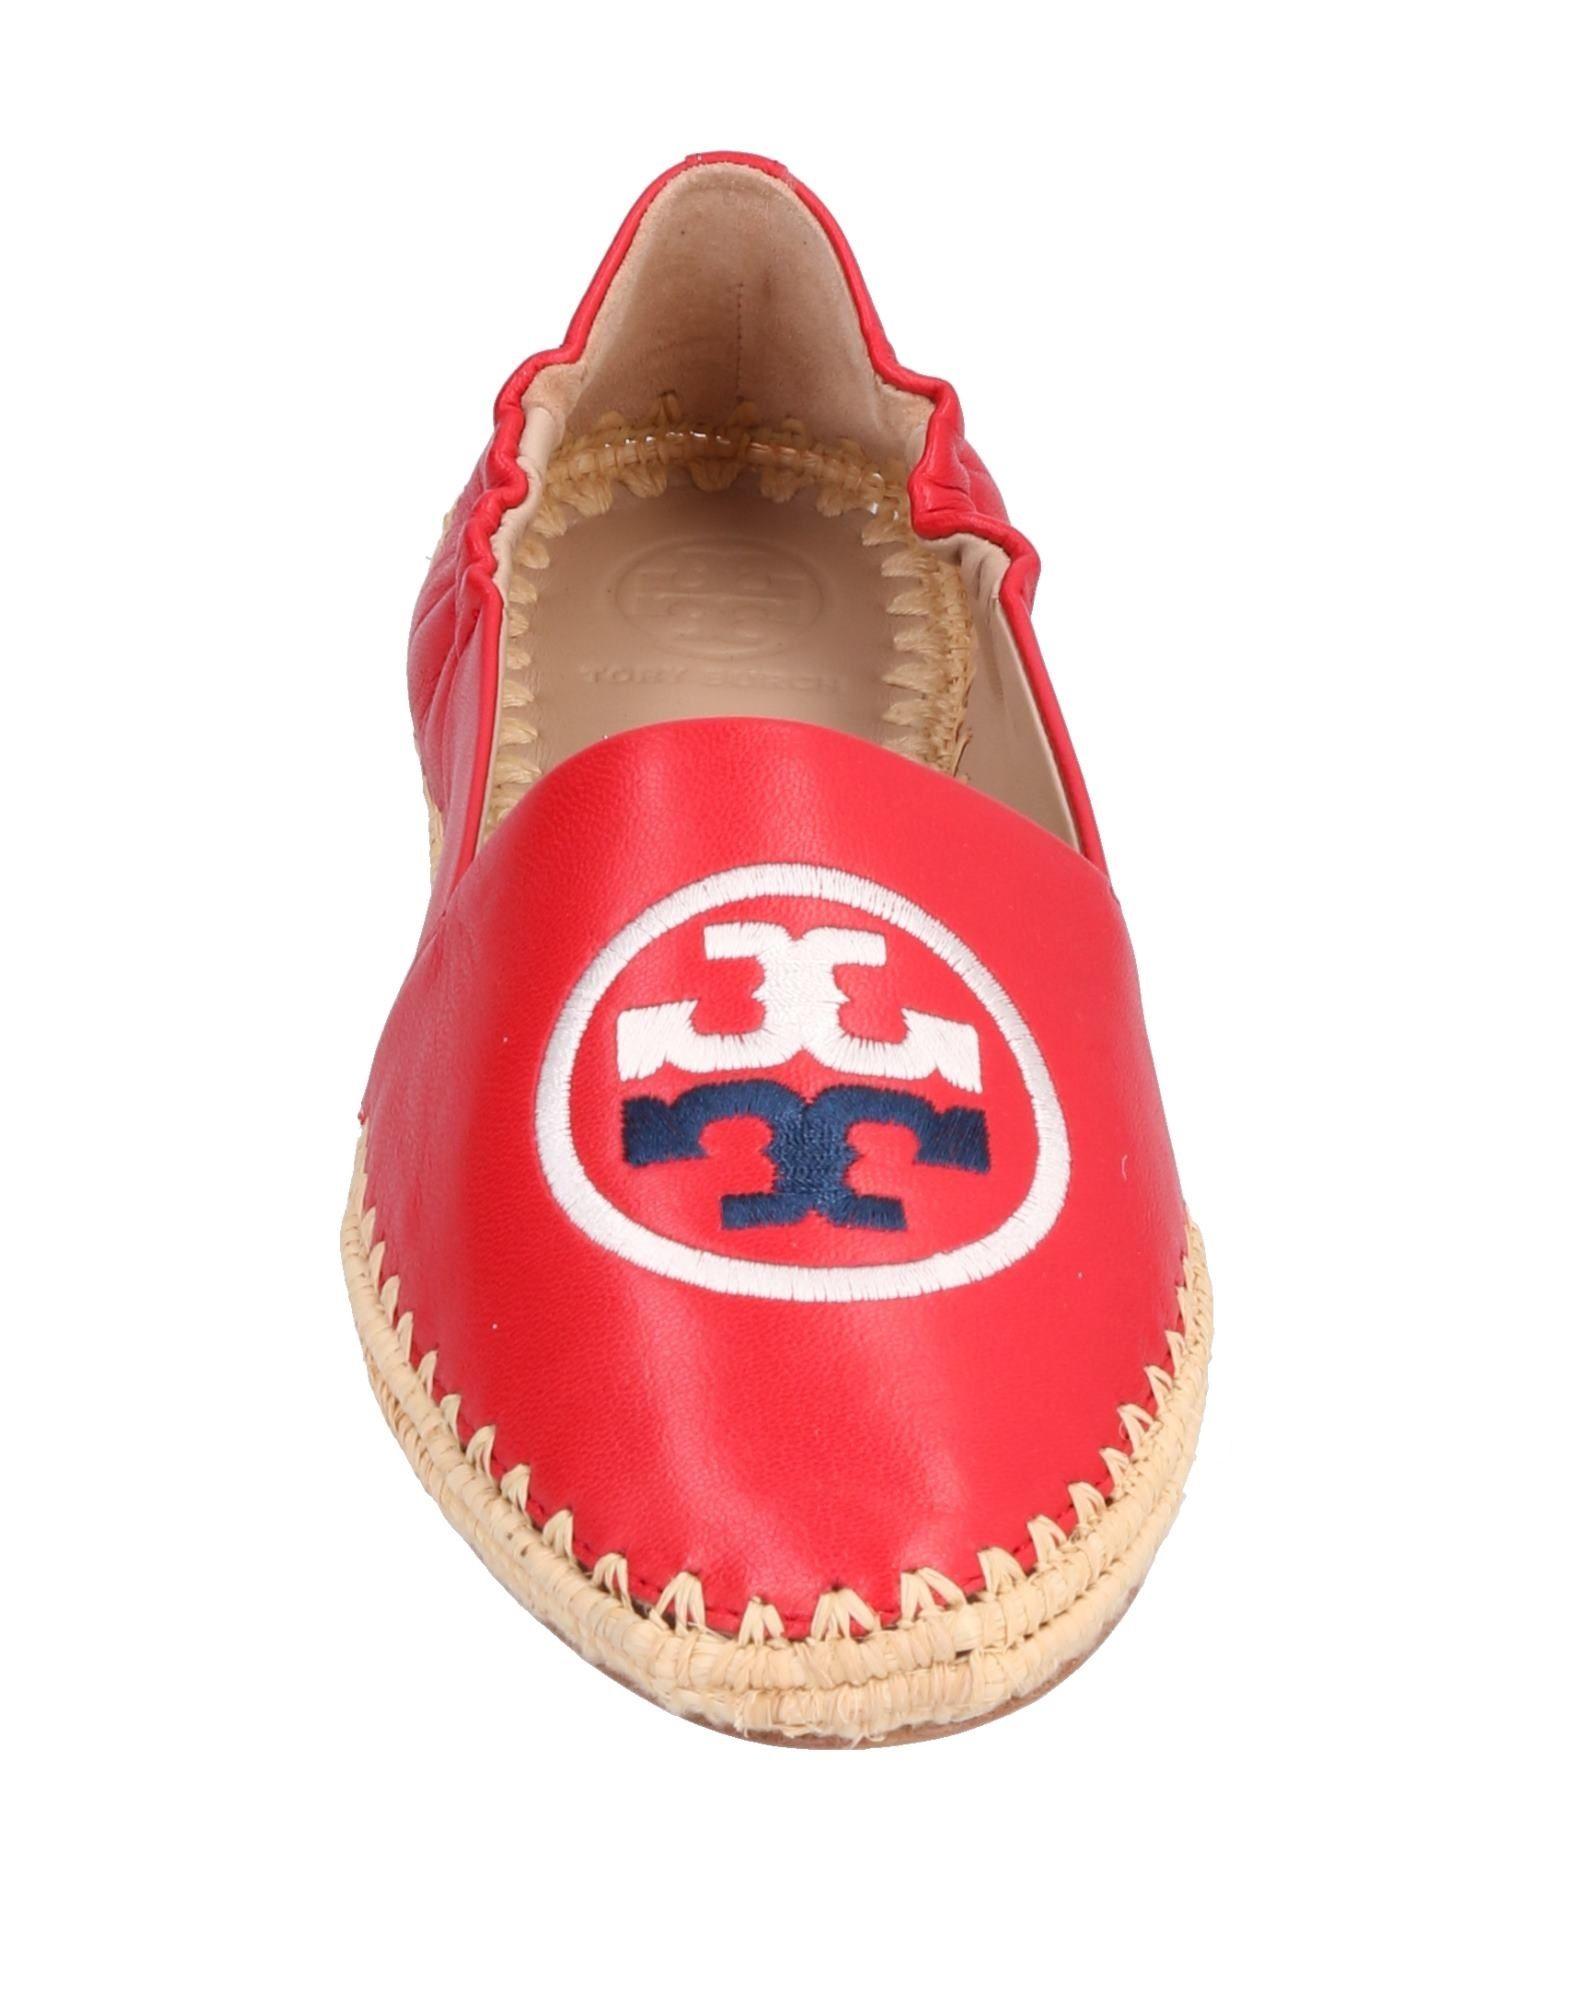 Stilvolle billige Schuhe  Tory Burch Espadrilles Damen  Schuhe 11421176BO cb7709